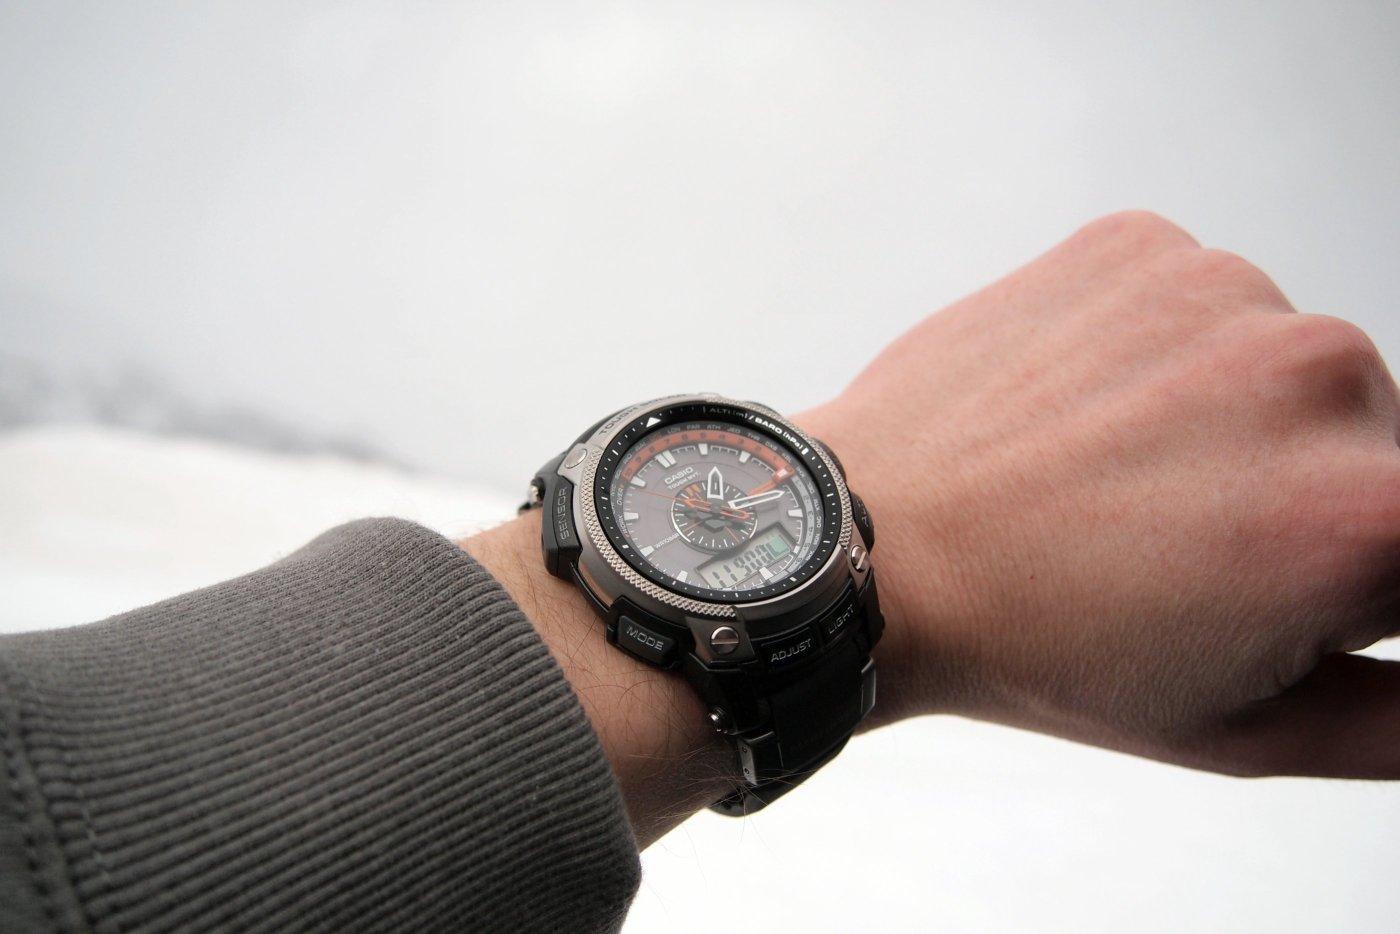 Casio Pathfinder at top of Loveland Pass